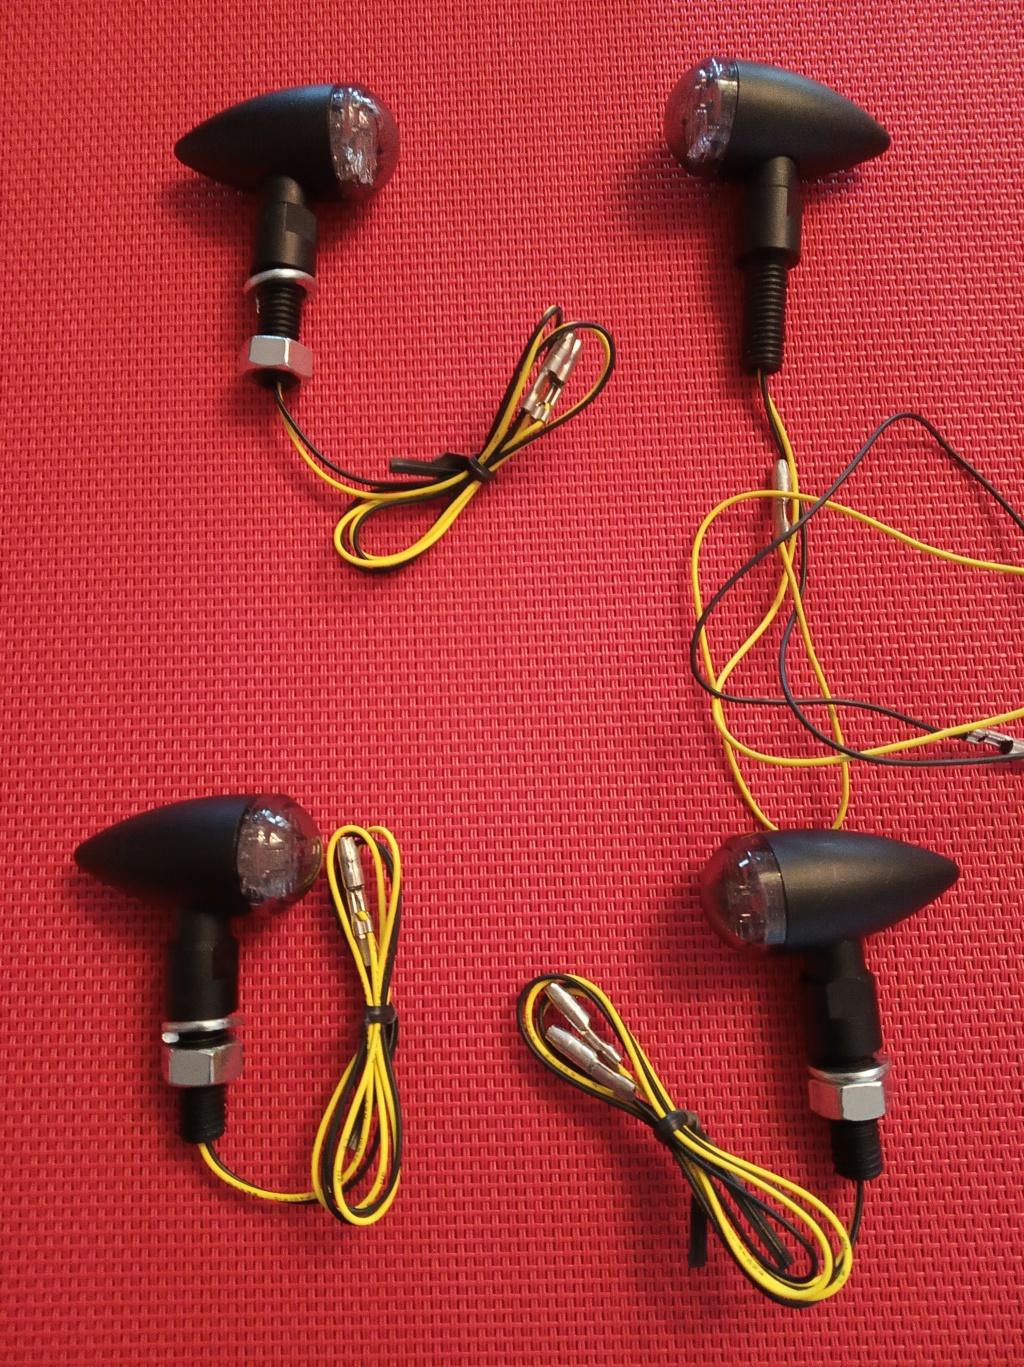 mini clignotants leds(VENDU) Cligno11